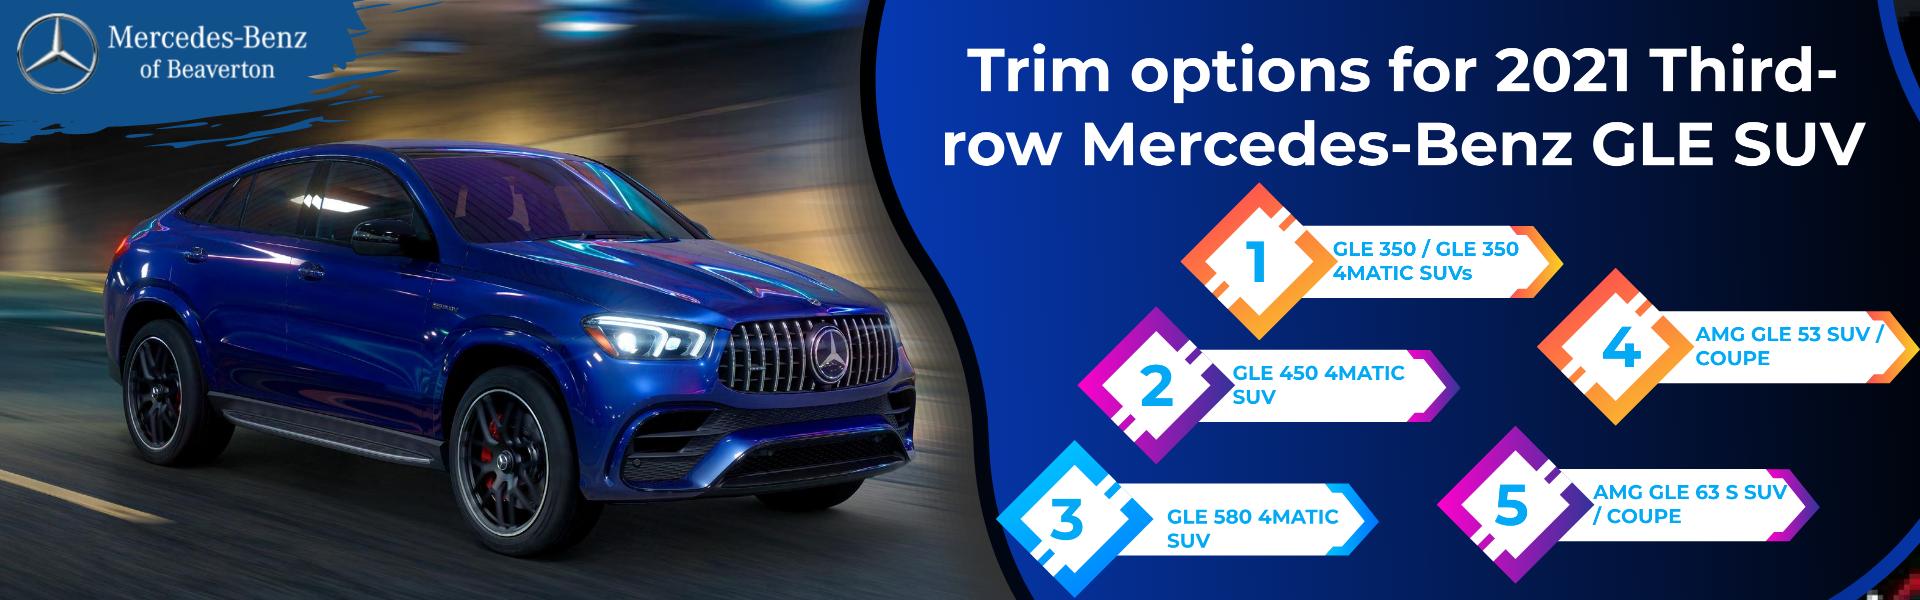 Trim options for 2021 Third-row Mercedes-Benz GLE SUV